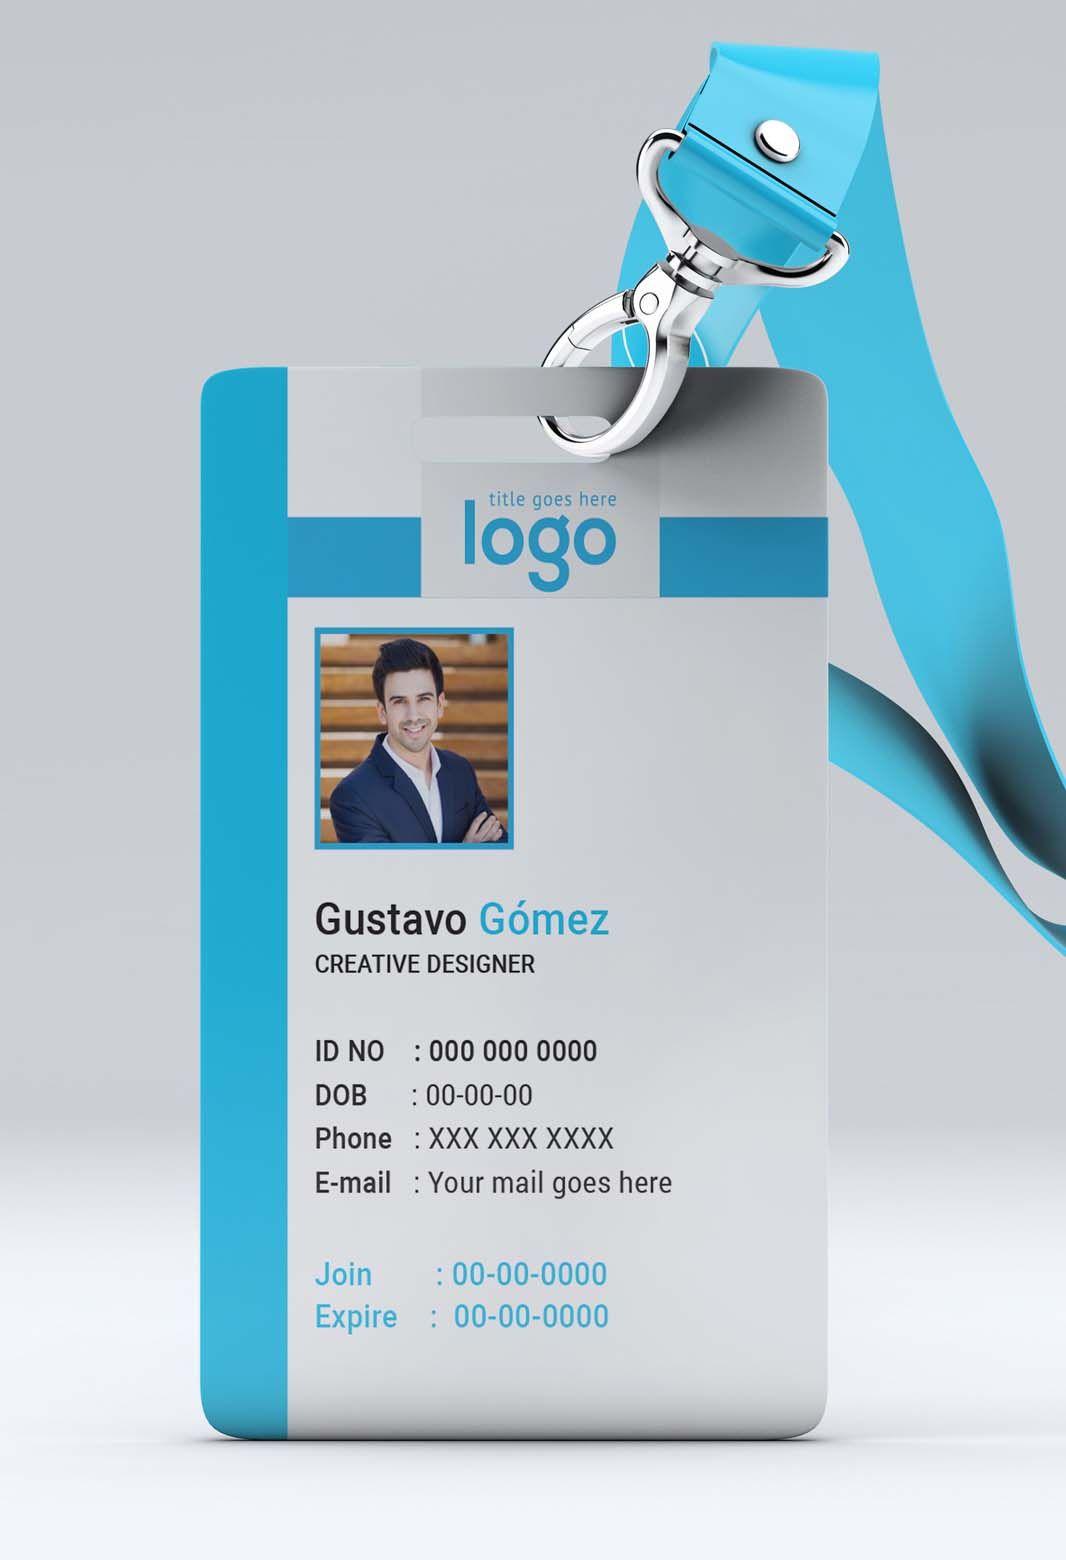 Creative Id Card Template 14 Mabd86 Free Graphics Inside Portrait Id Card T Id Card Template Free Business Card Templates Business Cards Creative Templates